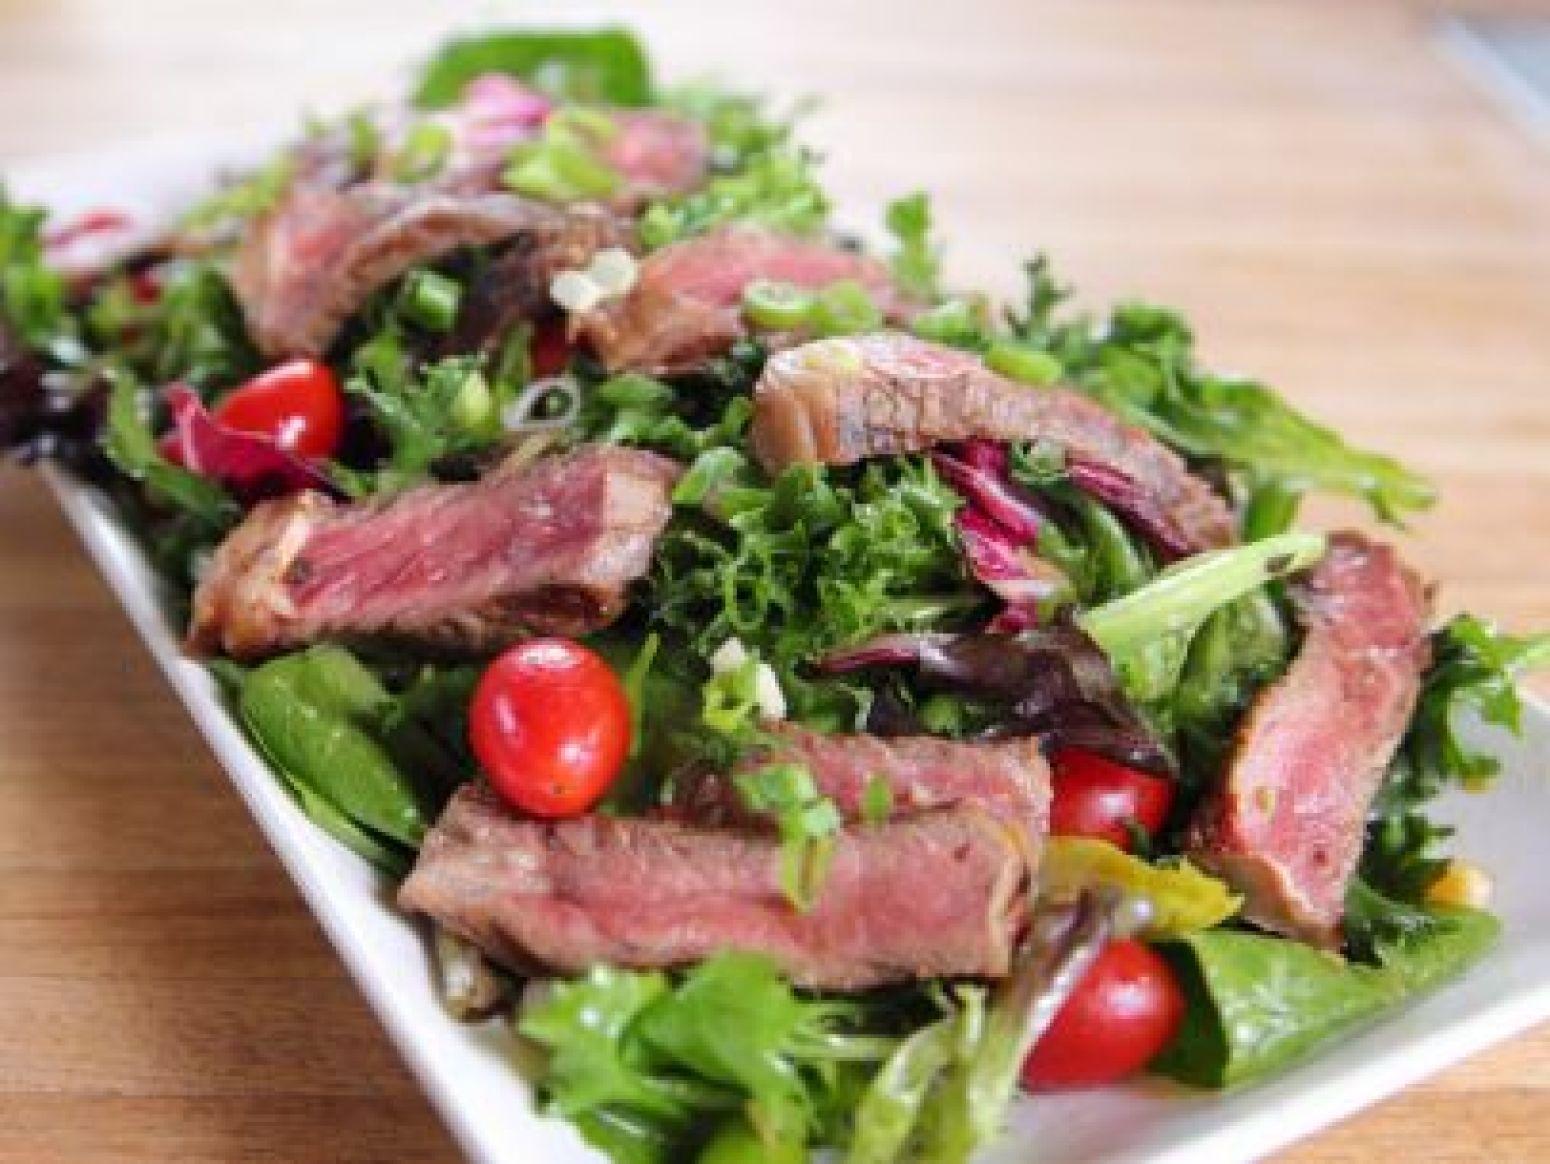 Ginger Steak Salad Recipe 2 | Just A Pinch Recipes